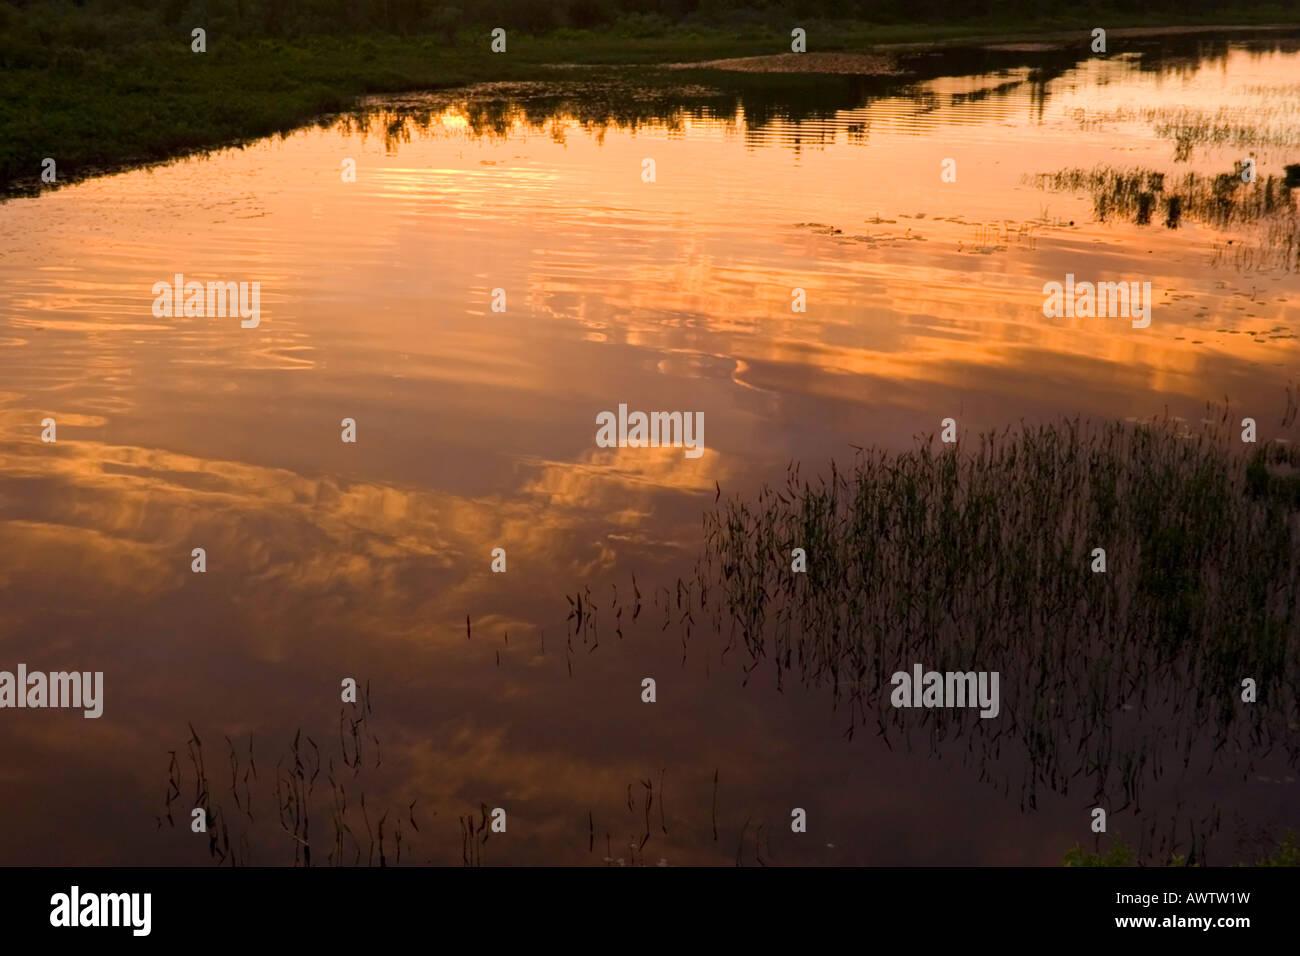 Sunset reflections in the Sacandaga River, Adirondack Mountains, New York, United States - Stock Image